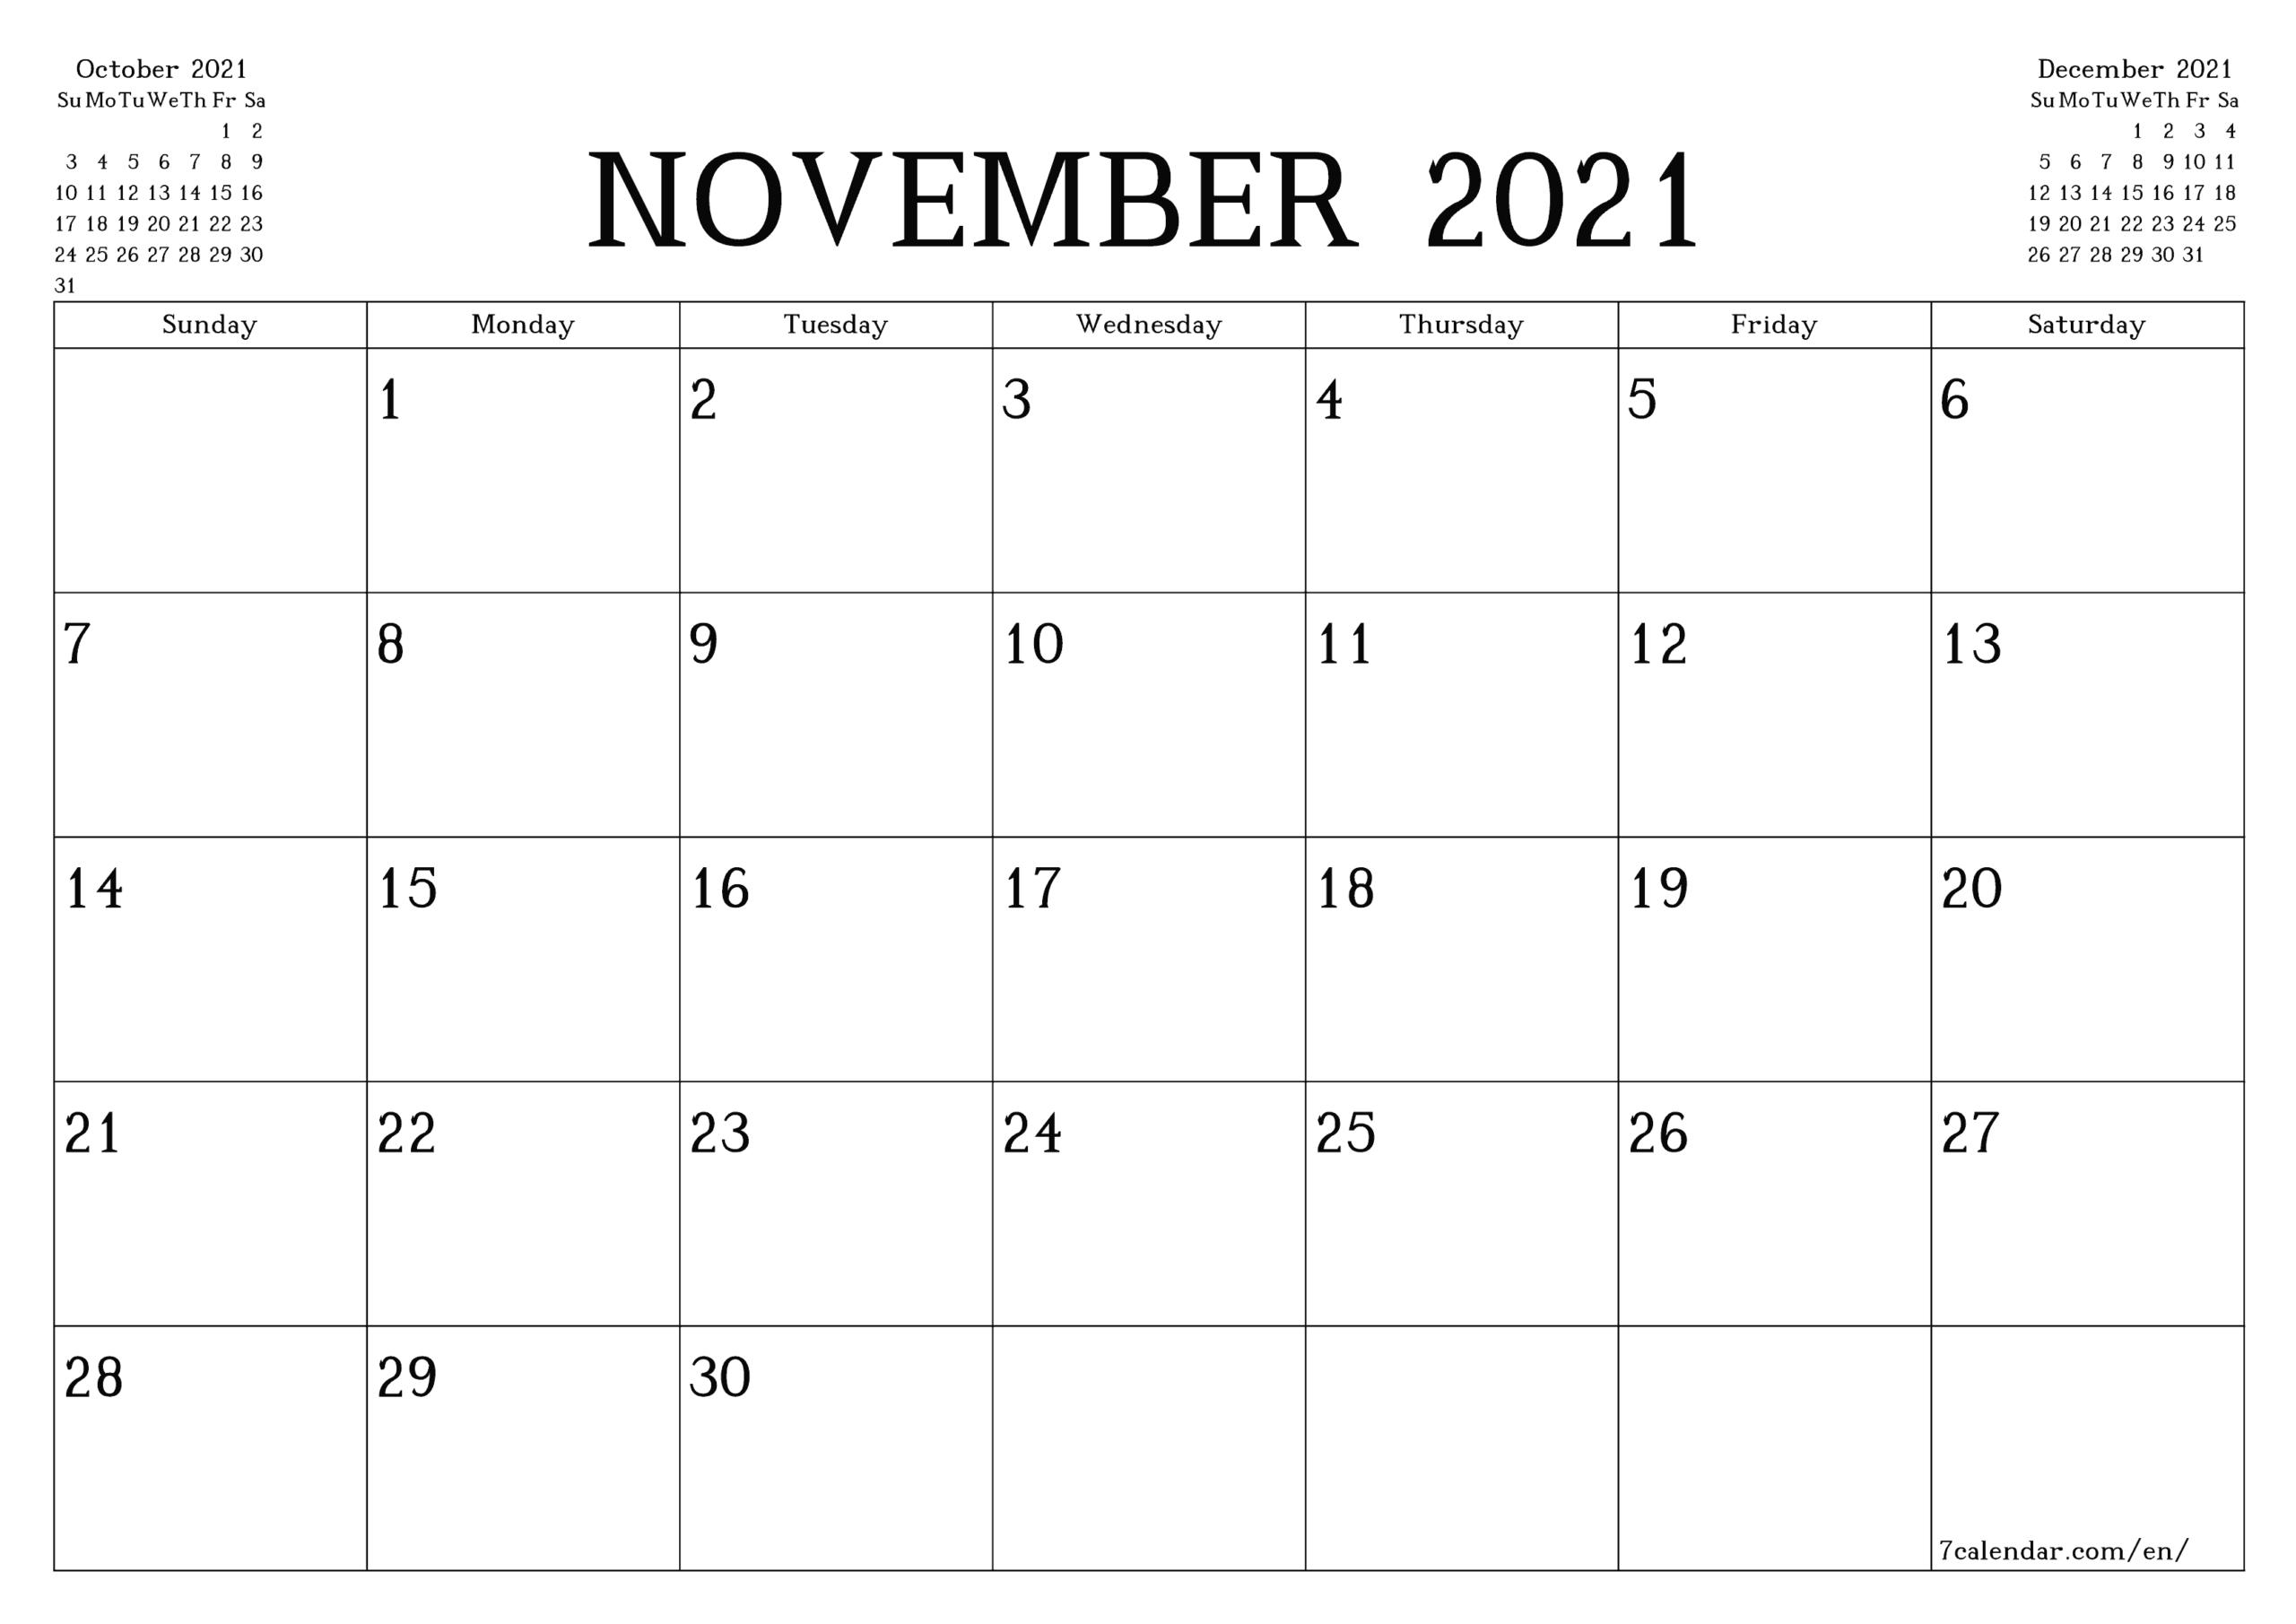 5 X 7 Printable Calendar 2021 6 Months | Printable regarding 2021 3 Month Monthly Printable Calendars